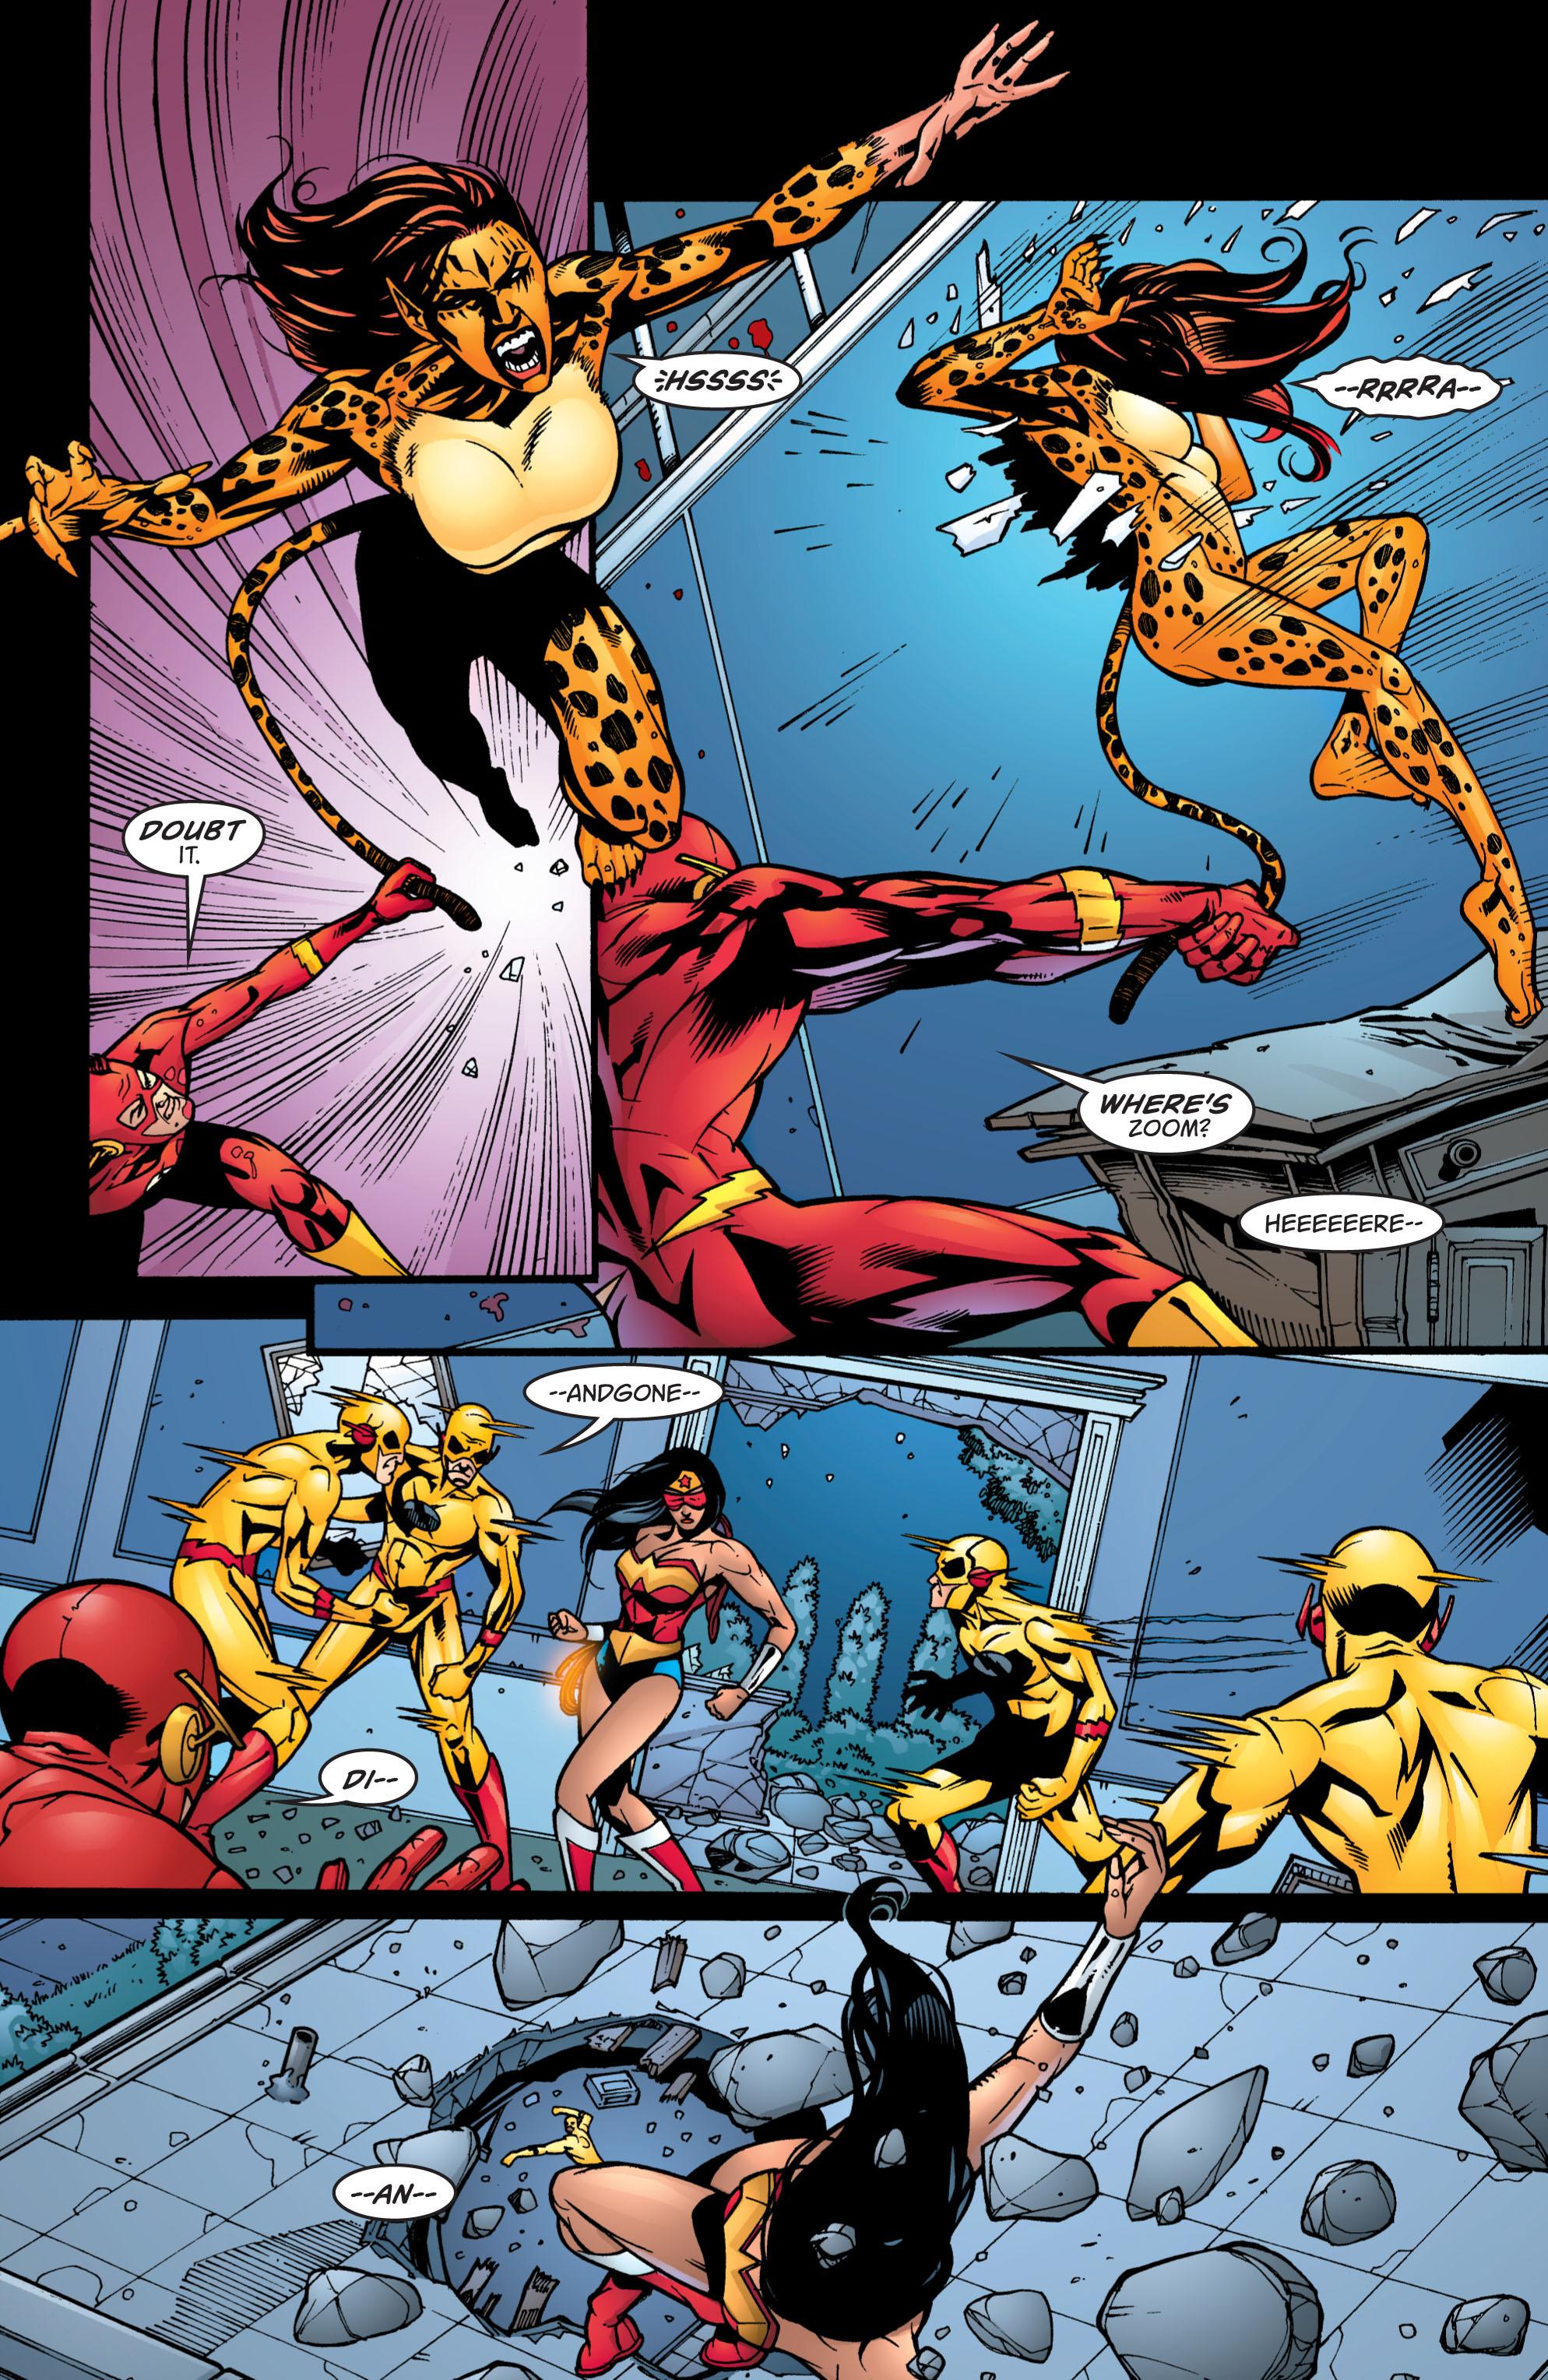 Read online Wonder Woman (1987) comic -  Issue #214 - 7